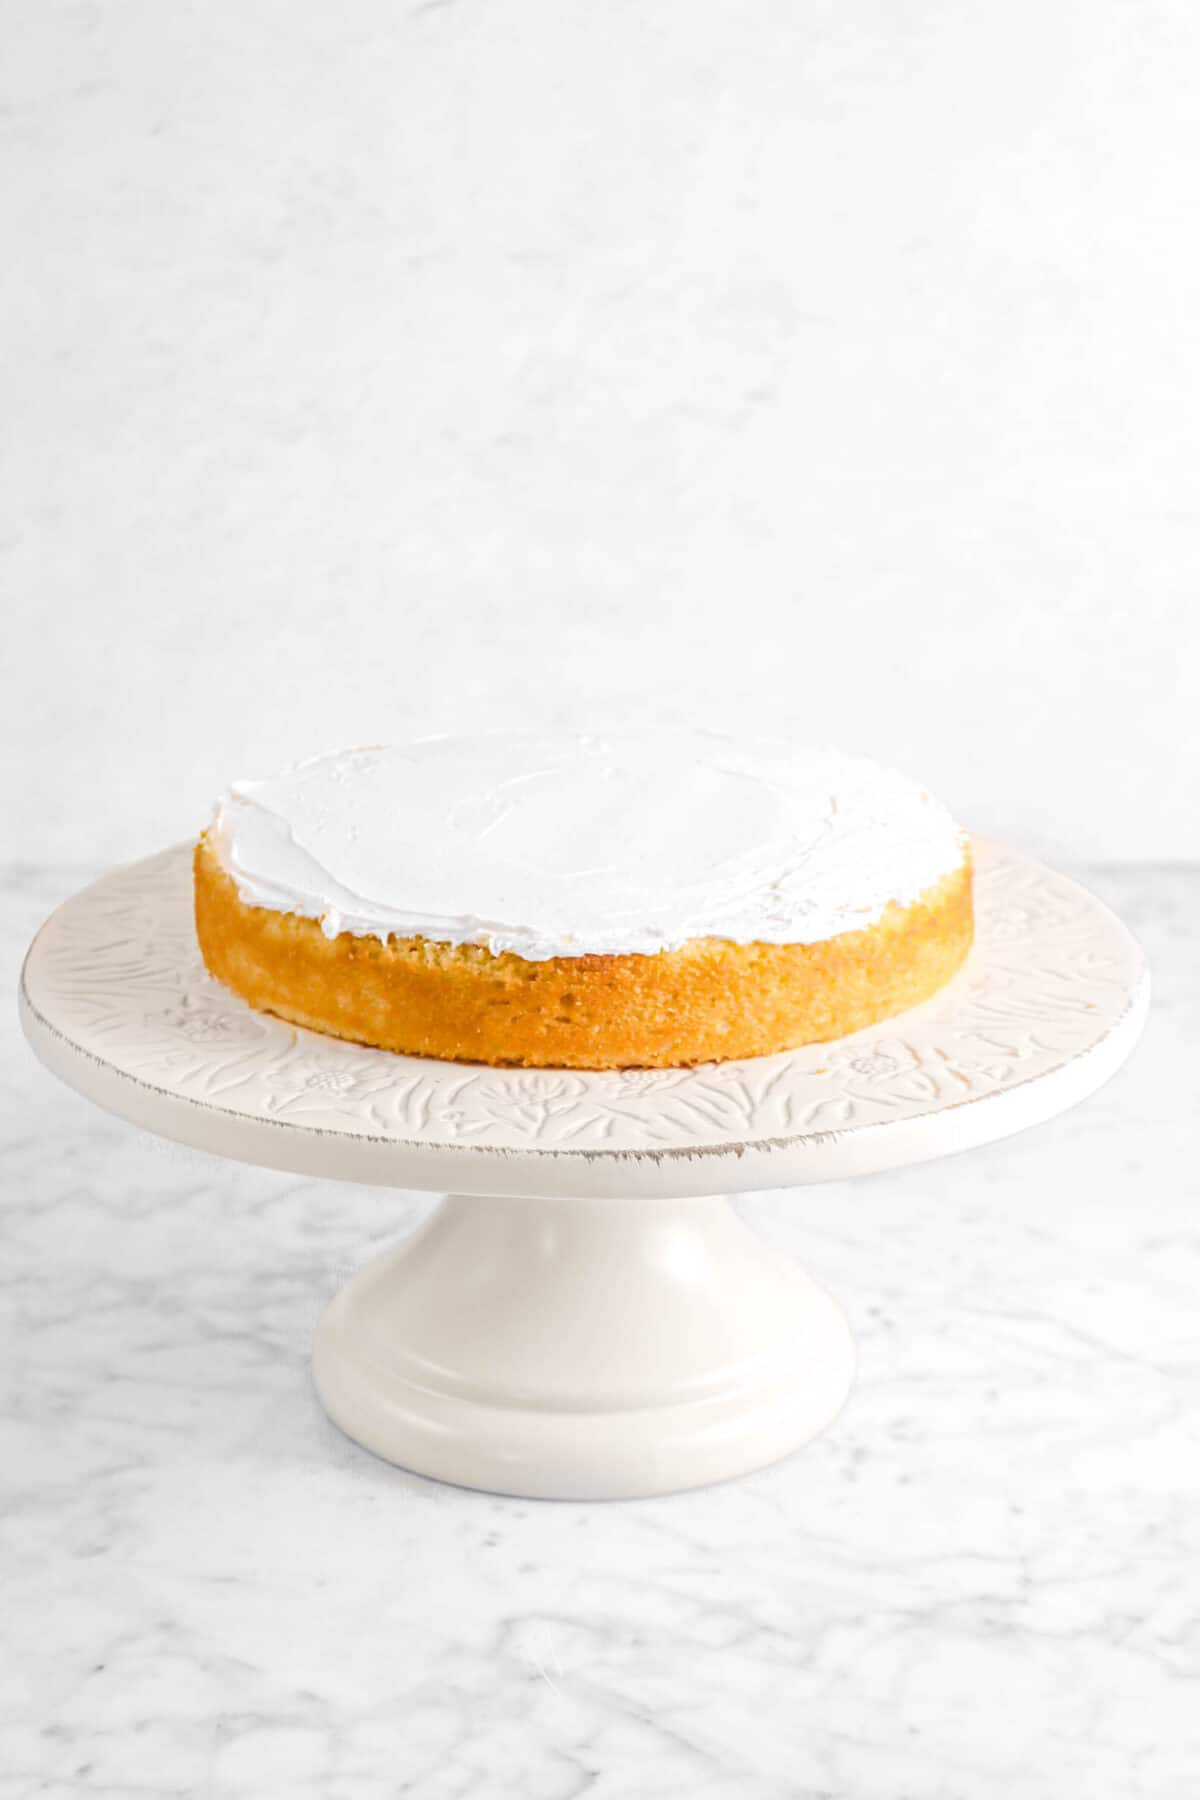 buttercream spread on cake layer